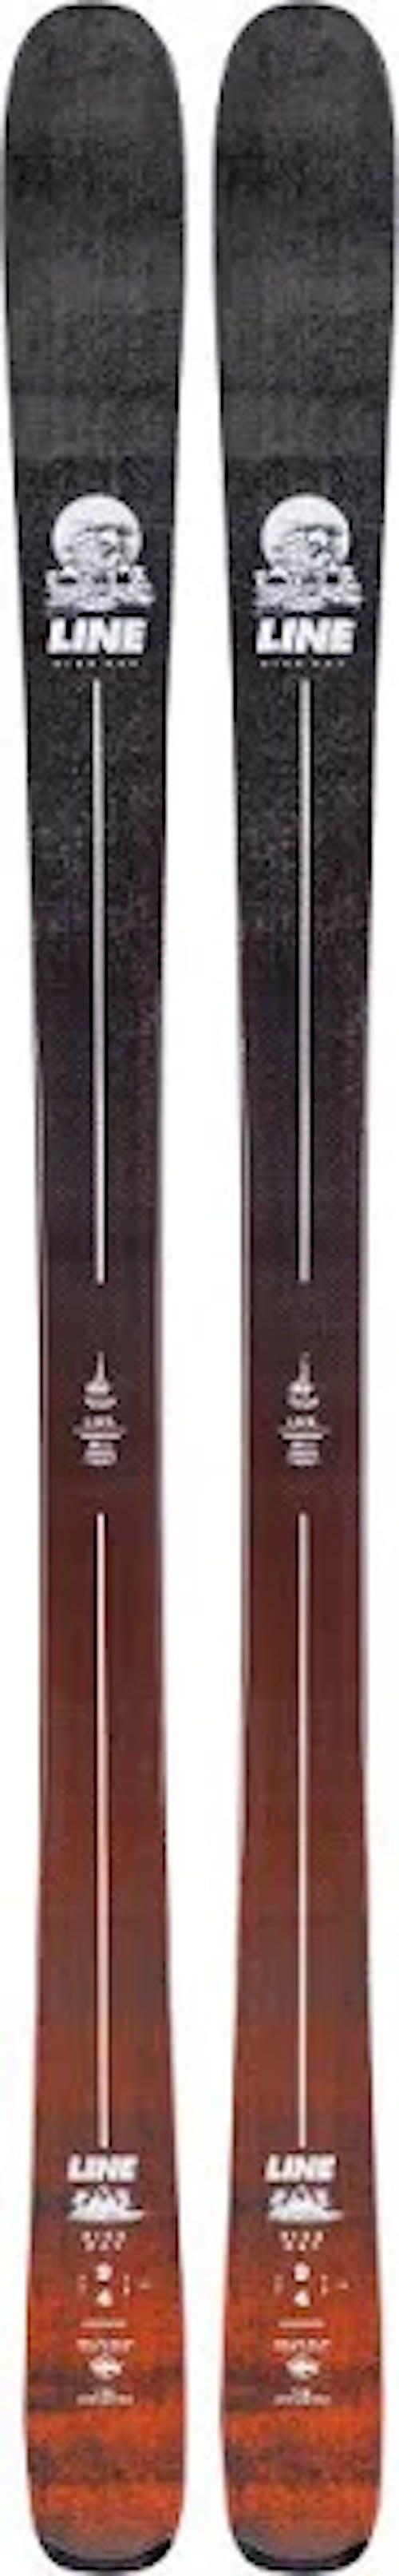 Line Sick Day 94 2020 Skis - 186 cm